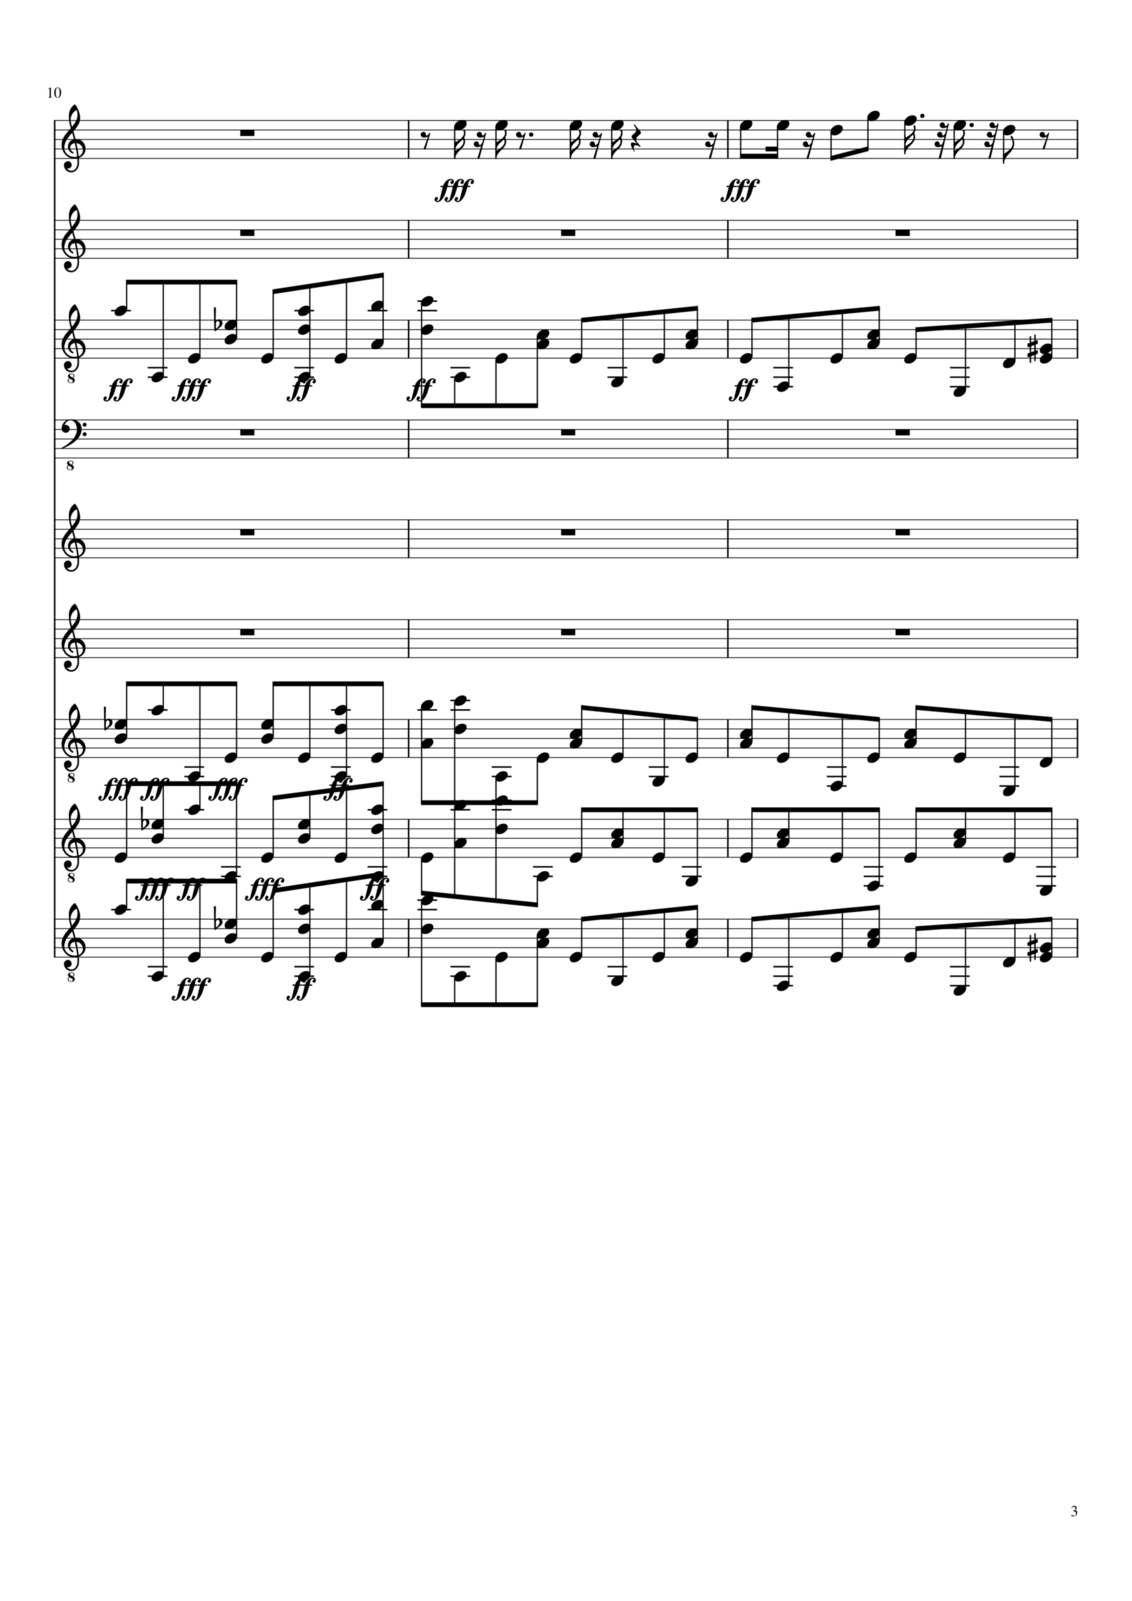 18 berez slide, Image 3